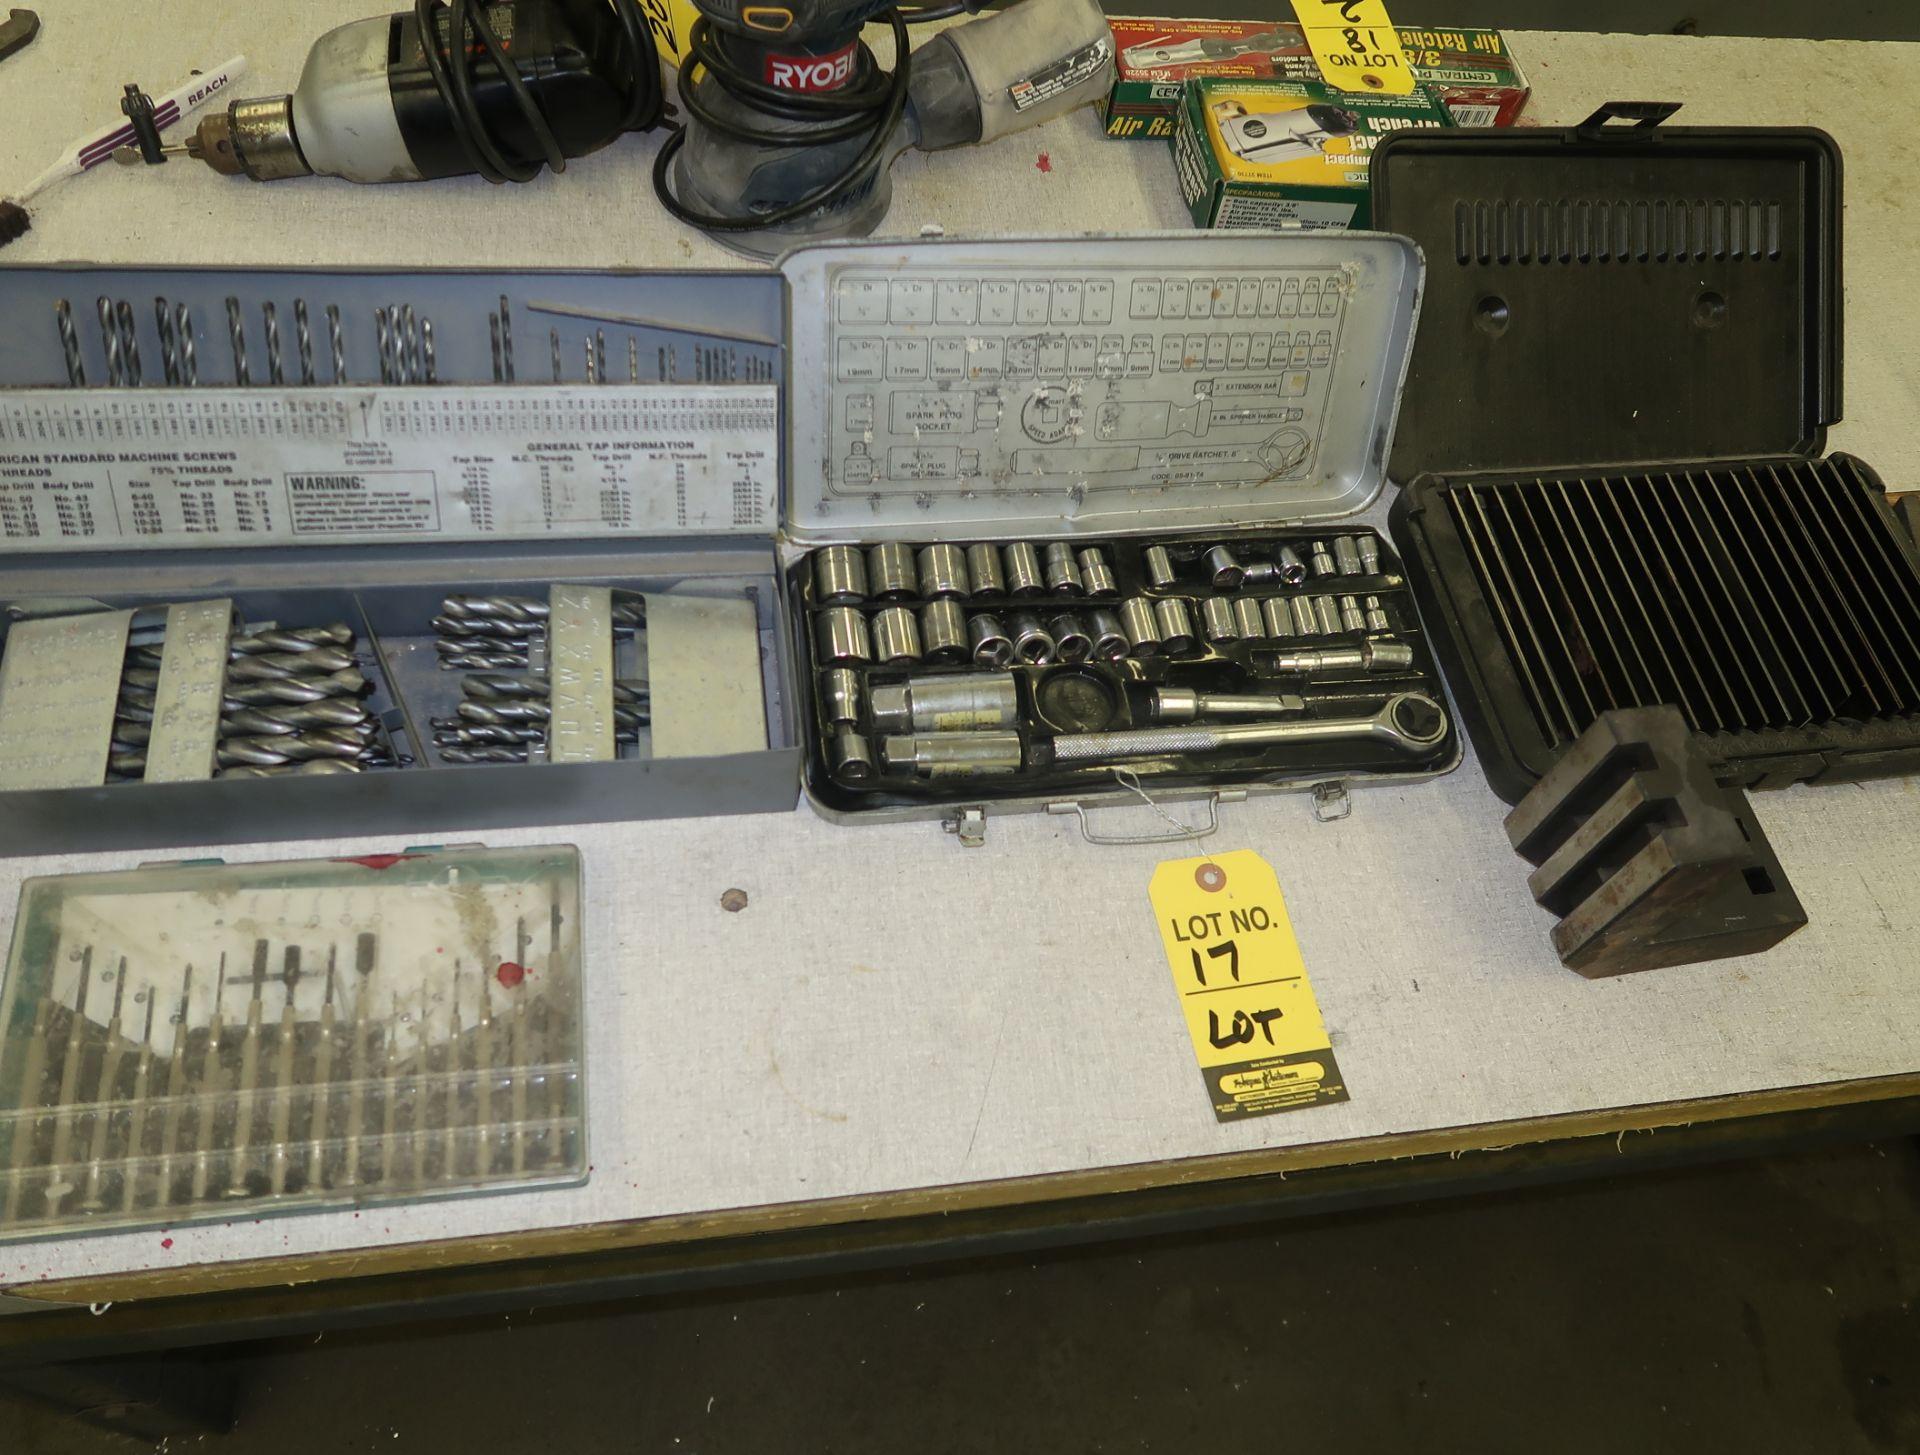 Lot 17 - LOT SOCKET SET, DRILL INDEX, PARALELLS, SMALL DRIVER SET, (2) KNIFE SETS